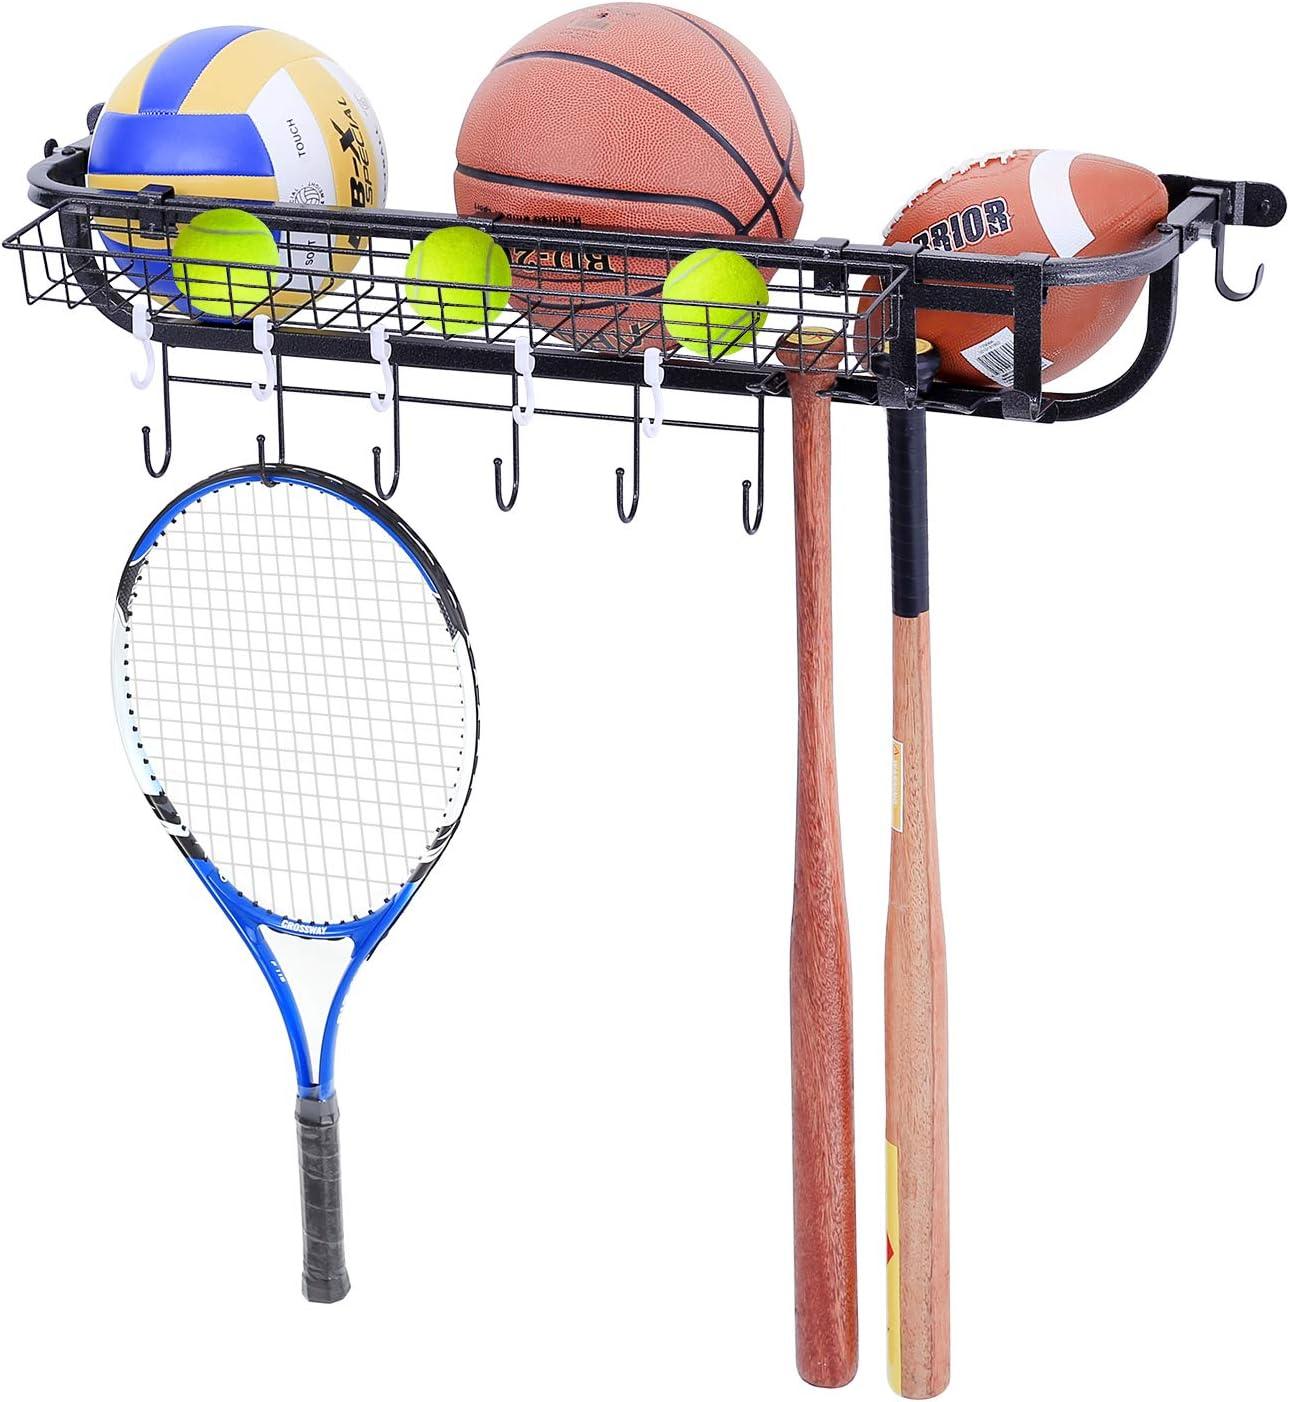 New Genuine color Mythinglogic Garage Sports Equipment Organizer Mounted Ball Wall